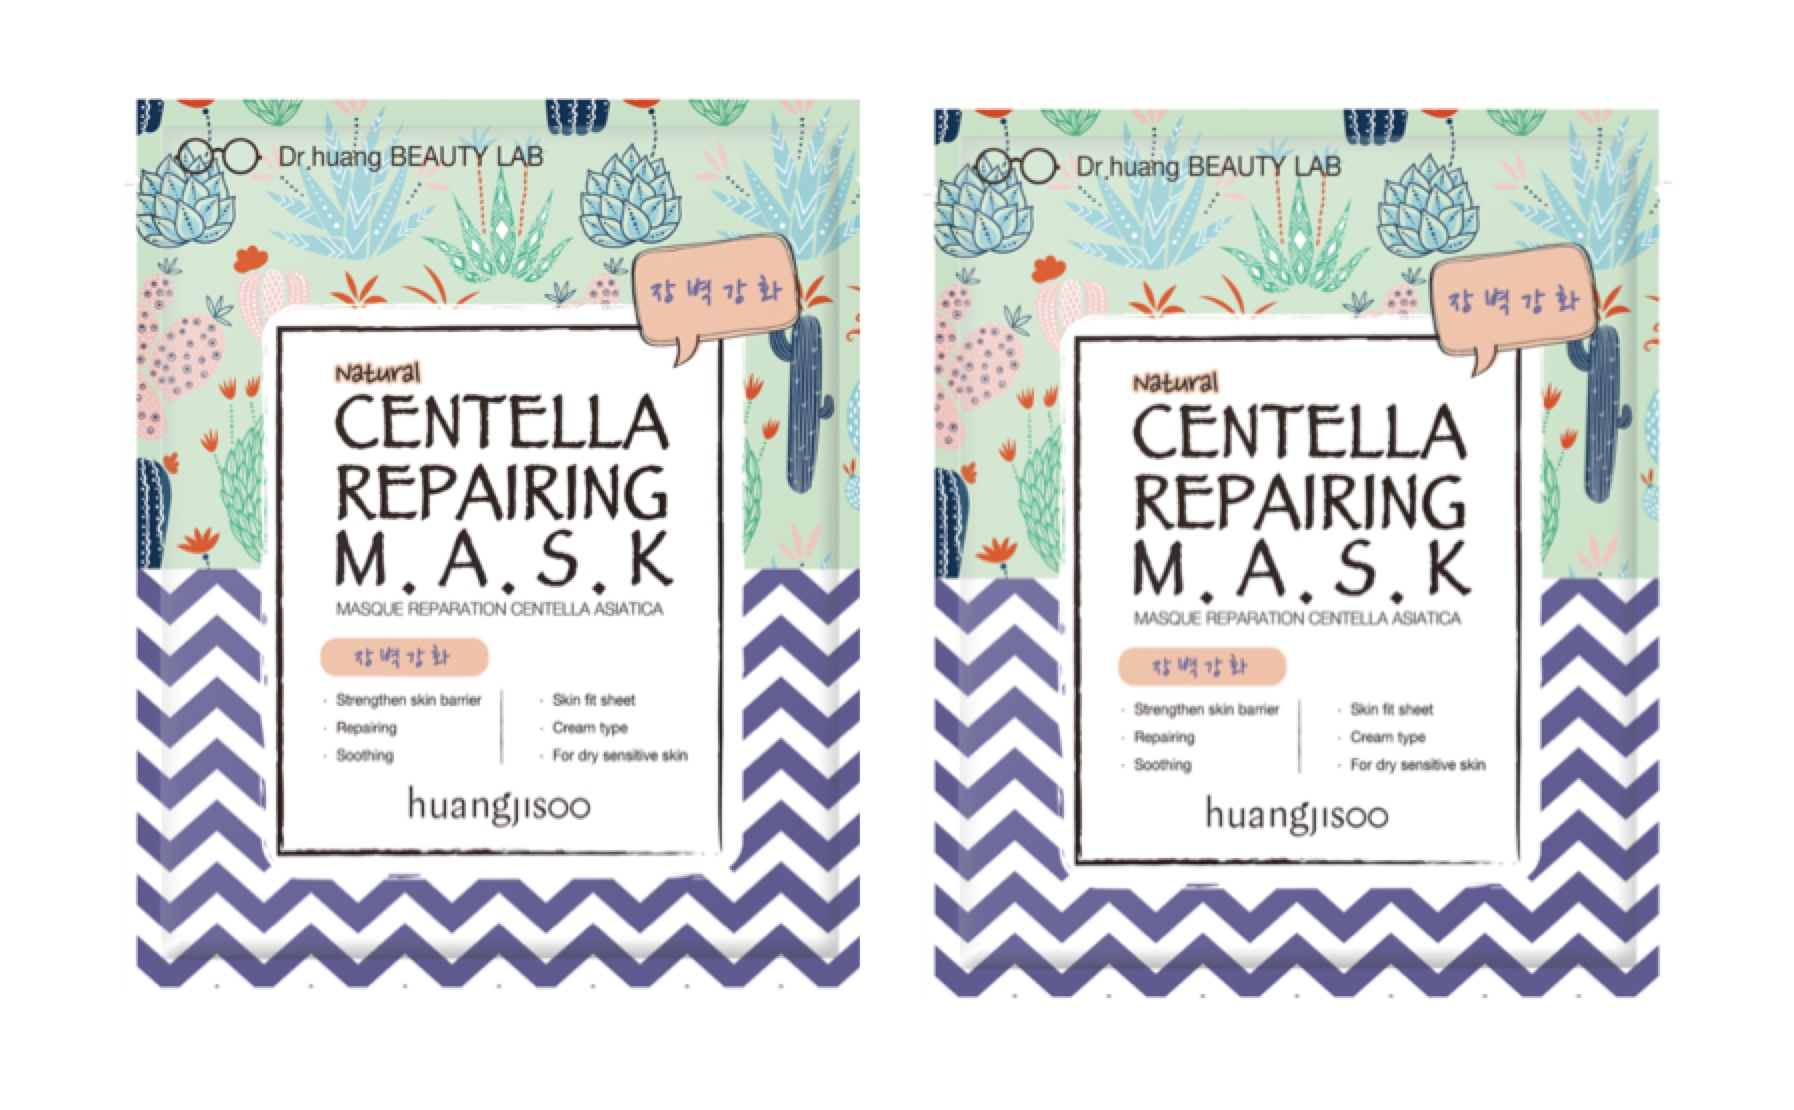 CENTELLA_REPAIRING_MASK.jpg